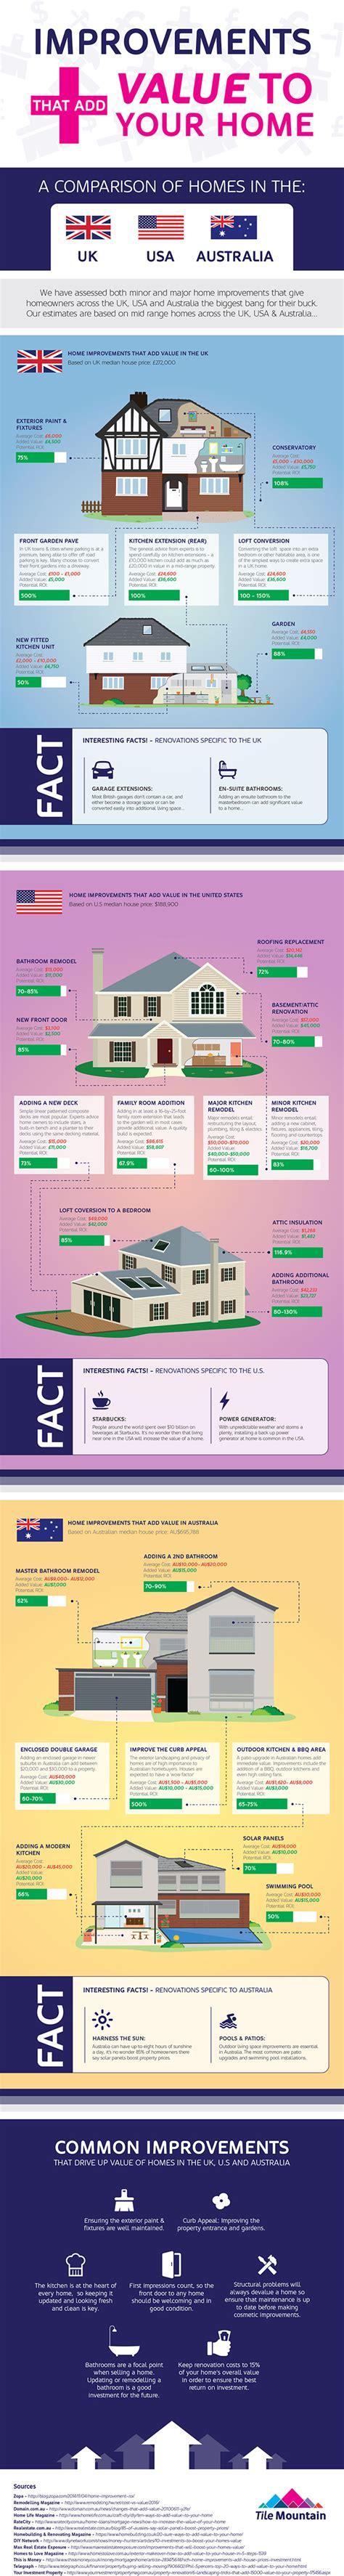 home improvements that add value to property uk vs u s vs